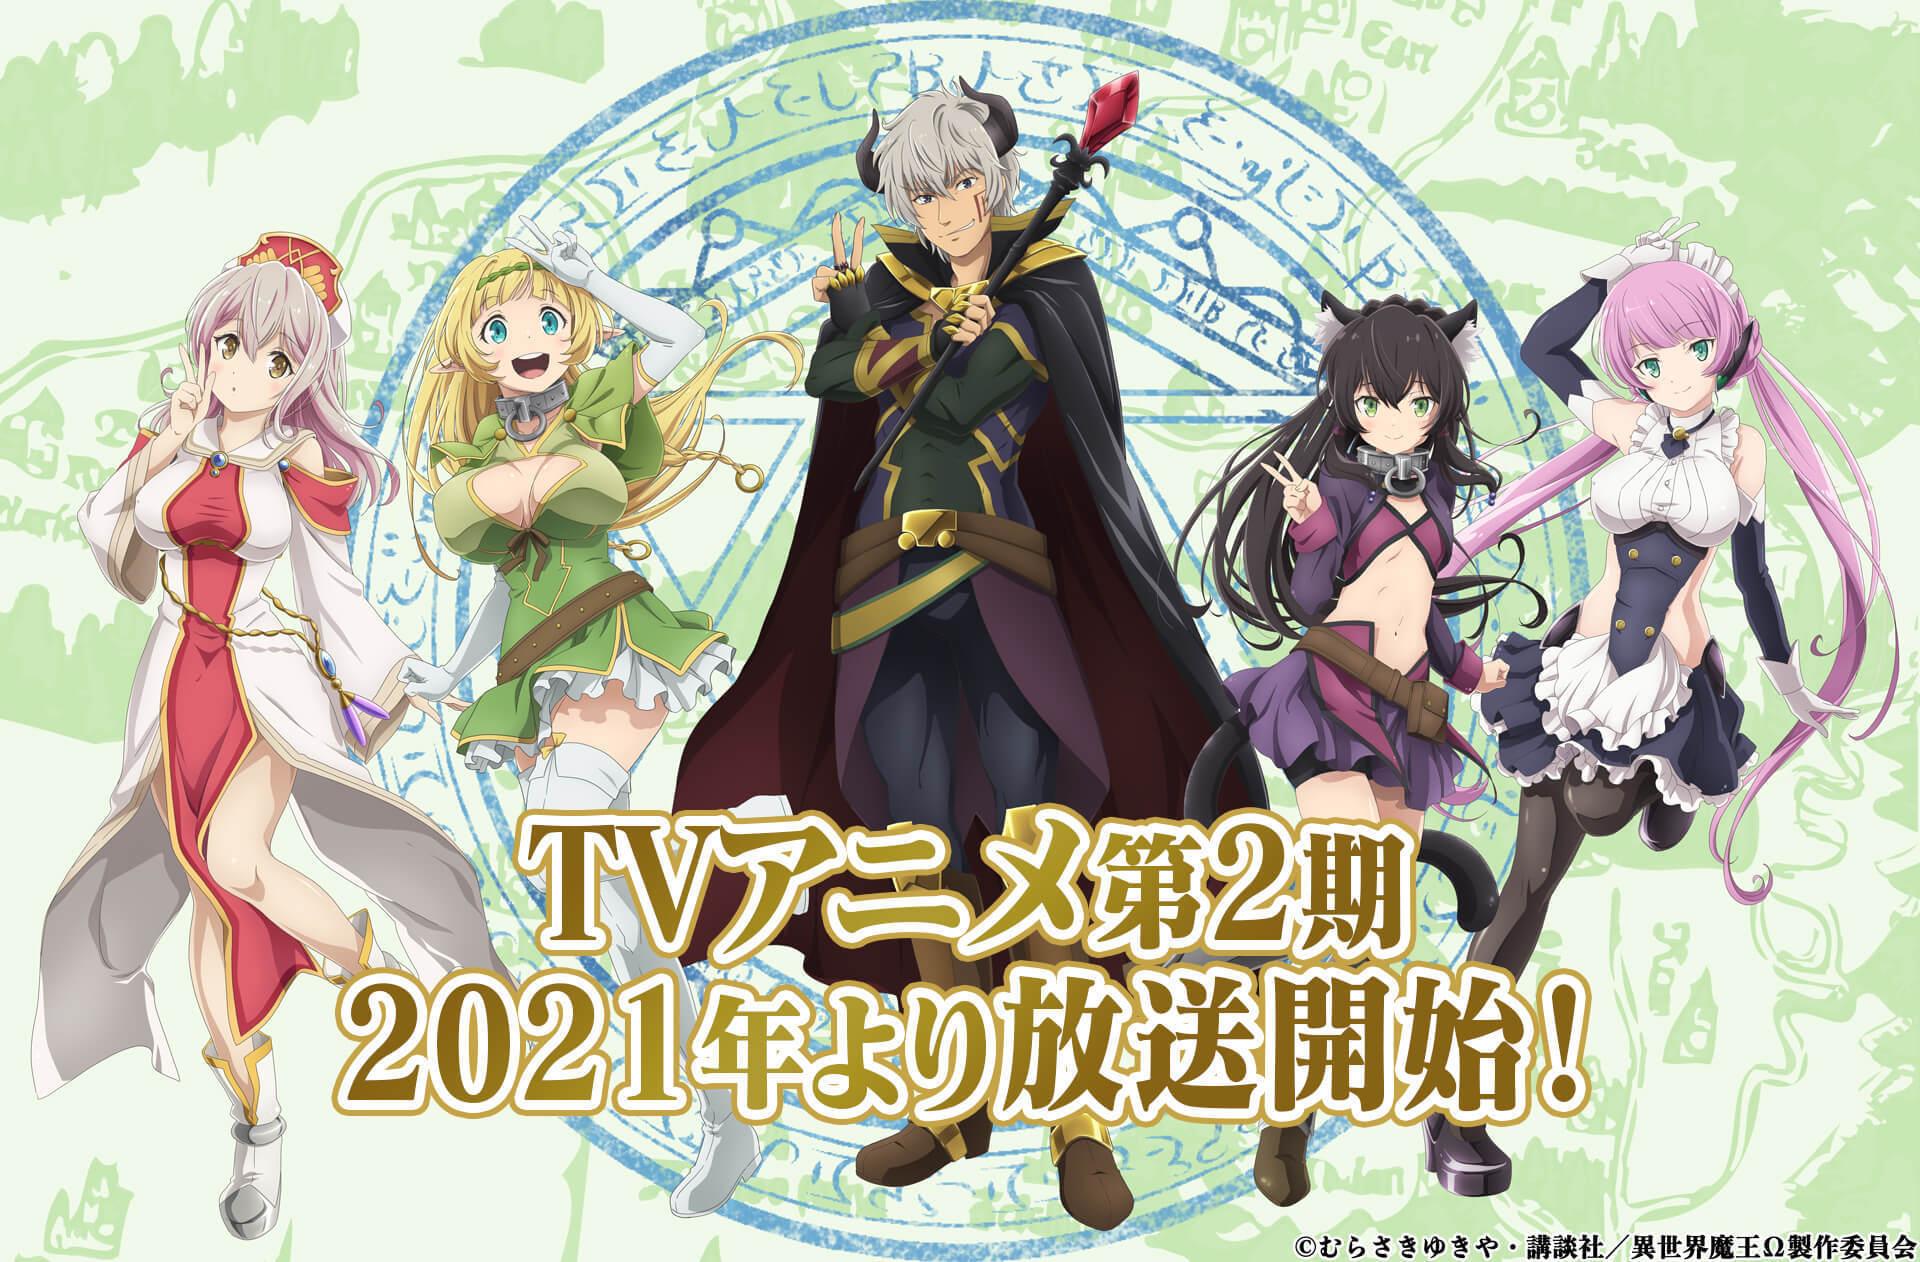 TV动画《异世界魔王与召唤少女的奴隶魔术》第二季确定制作,将于2021年播出- ACG17.COM